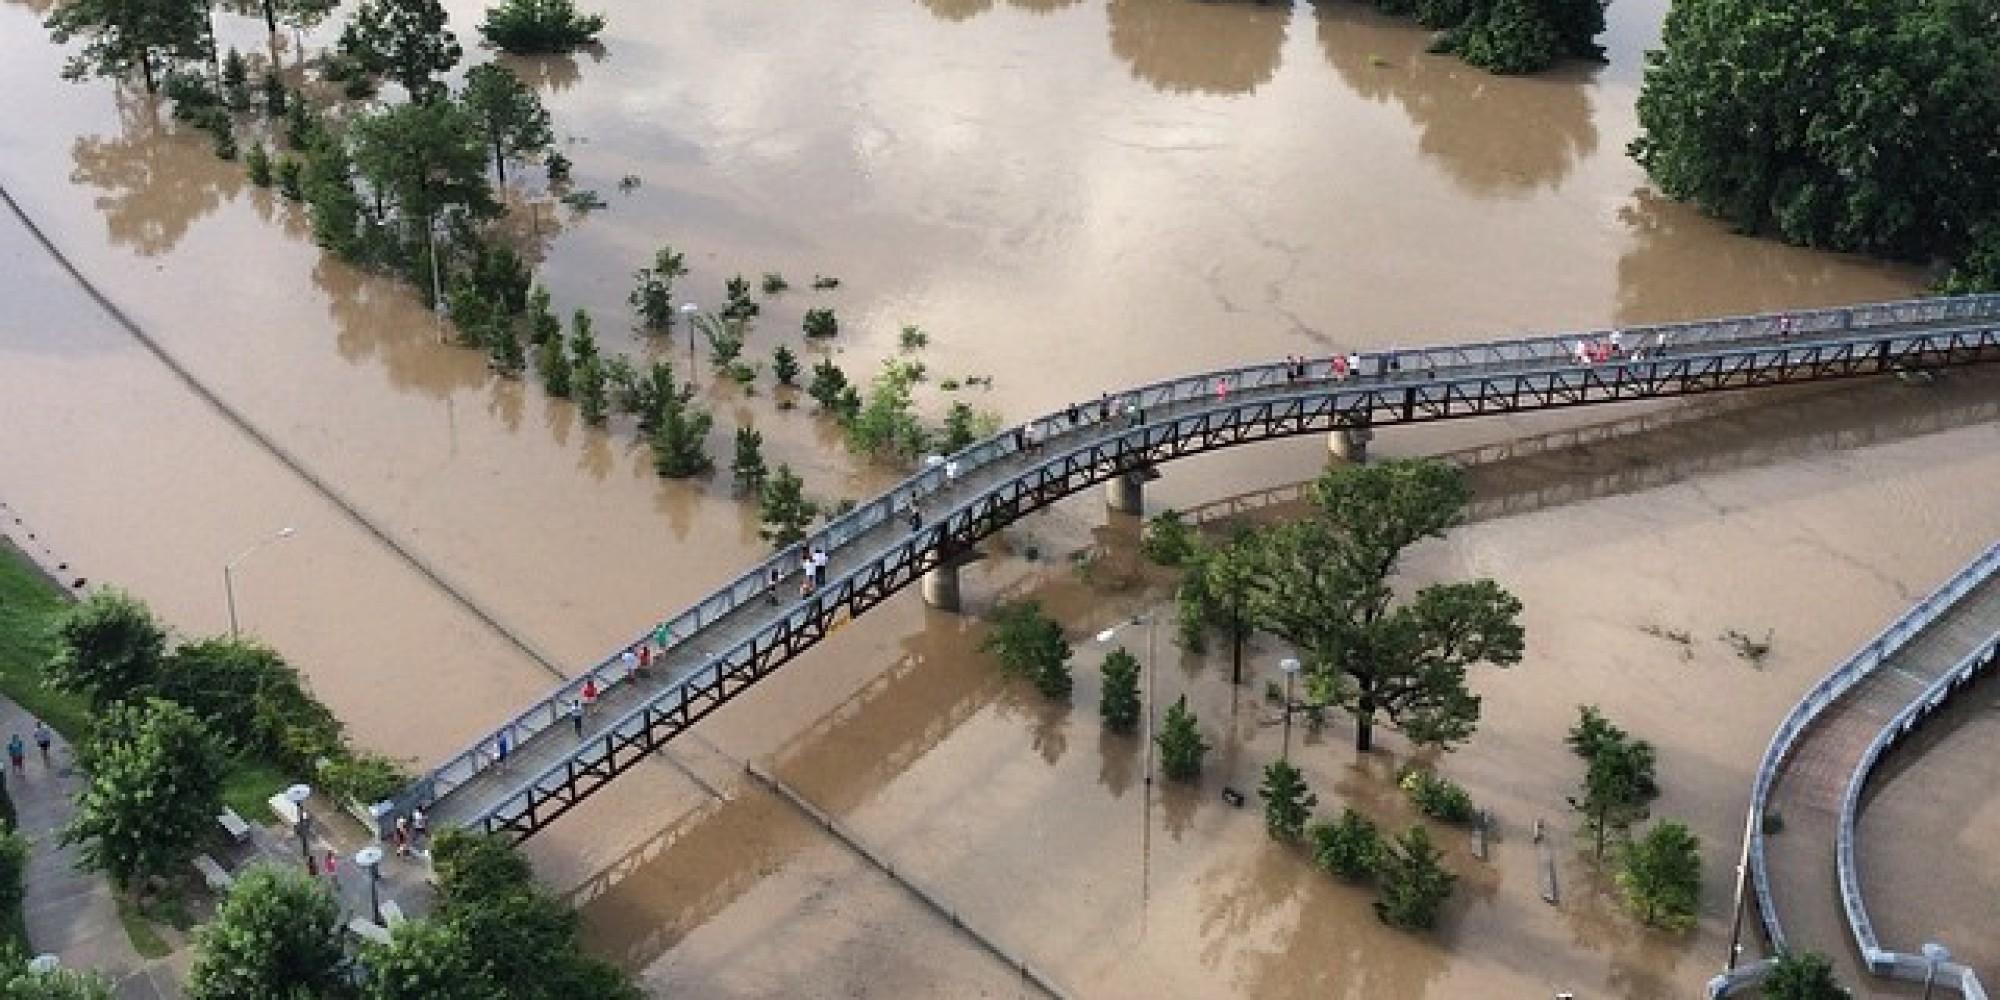 houston flooding - photo #17